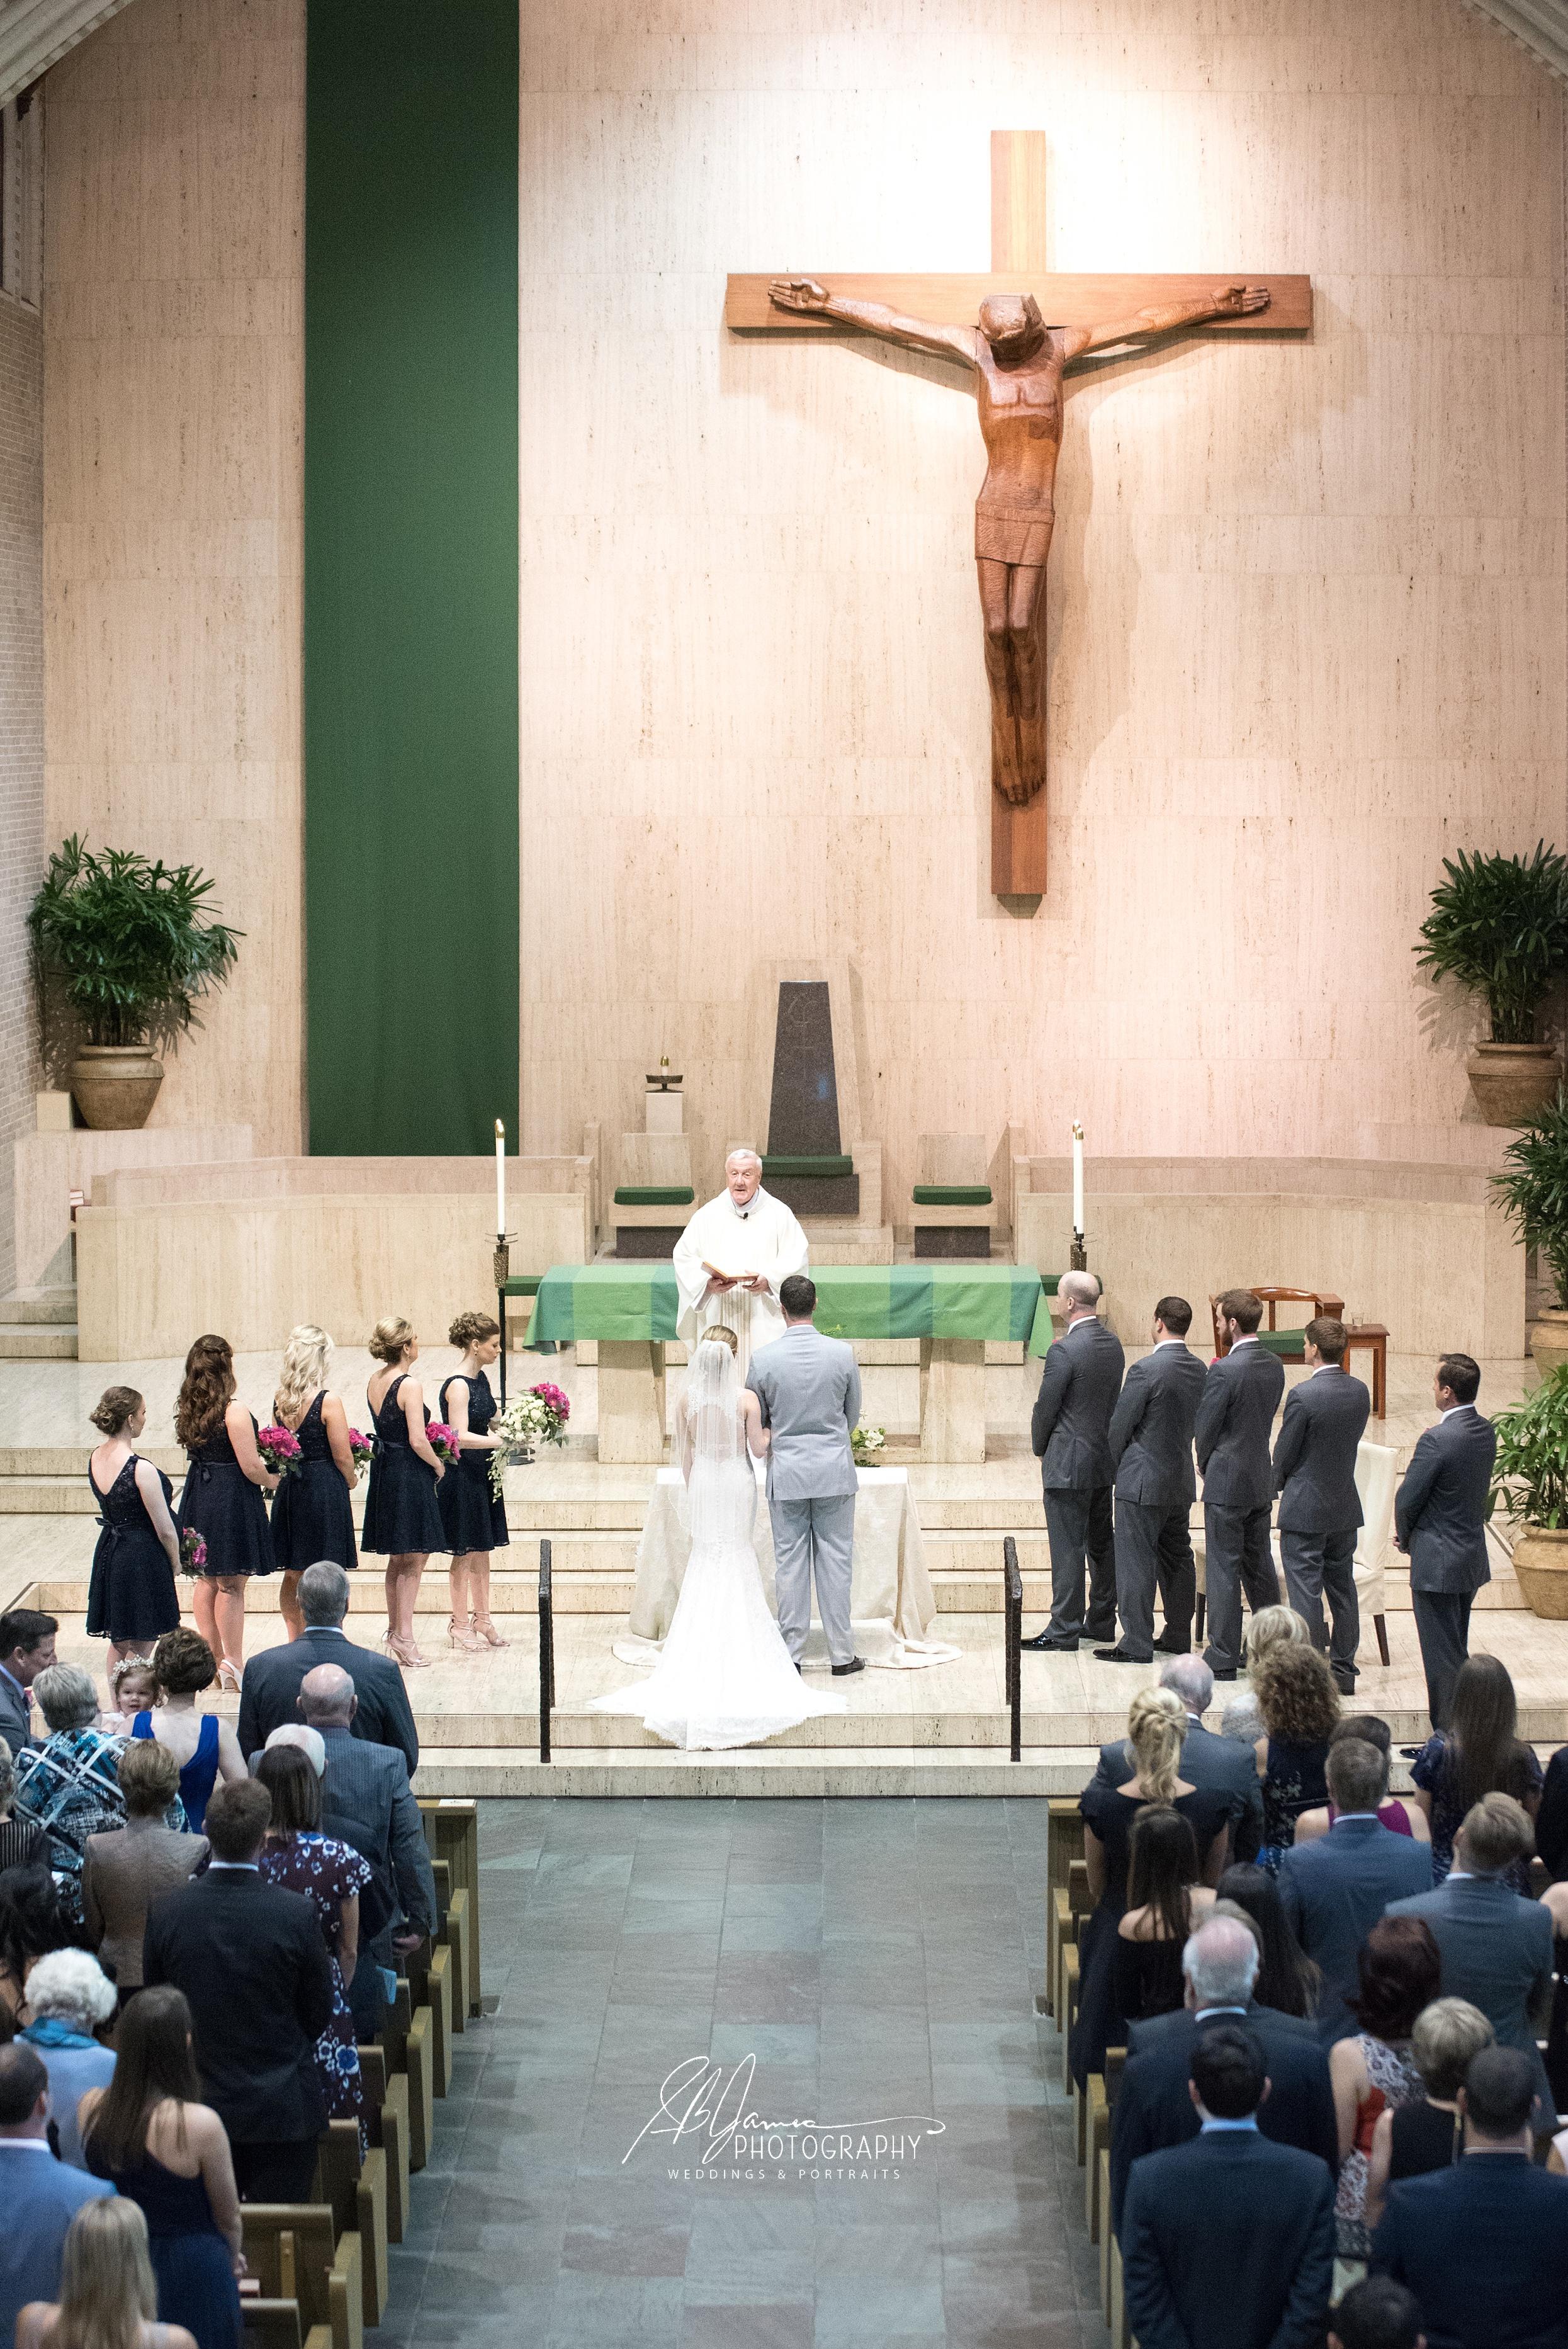 Baton Rouge Louisiana Wedding Photographer Destination Weddings Downtown Elegant Romantic Authentic New Orleans Lafayette